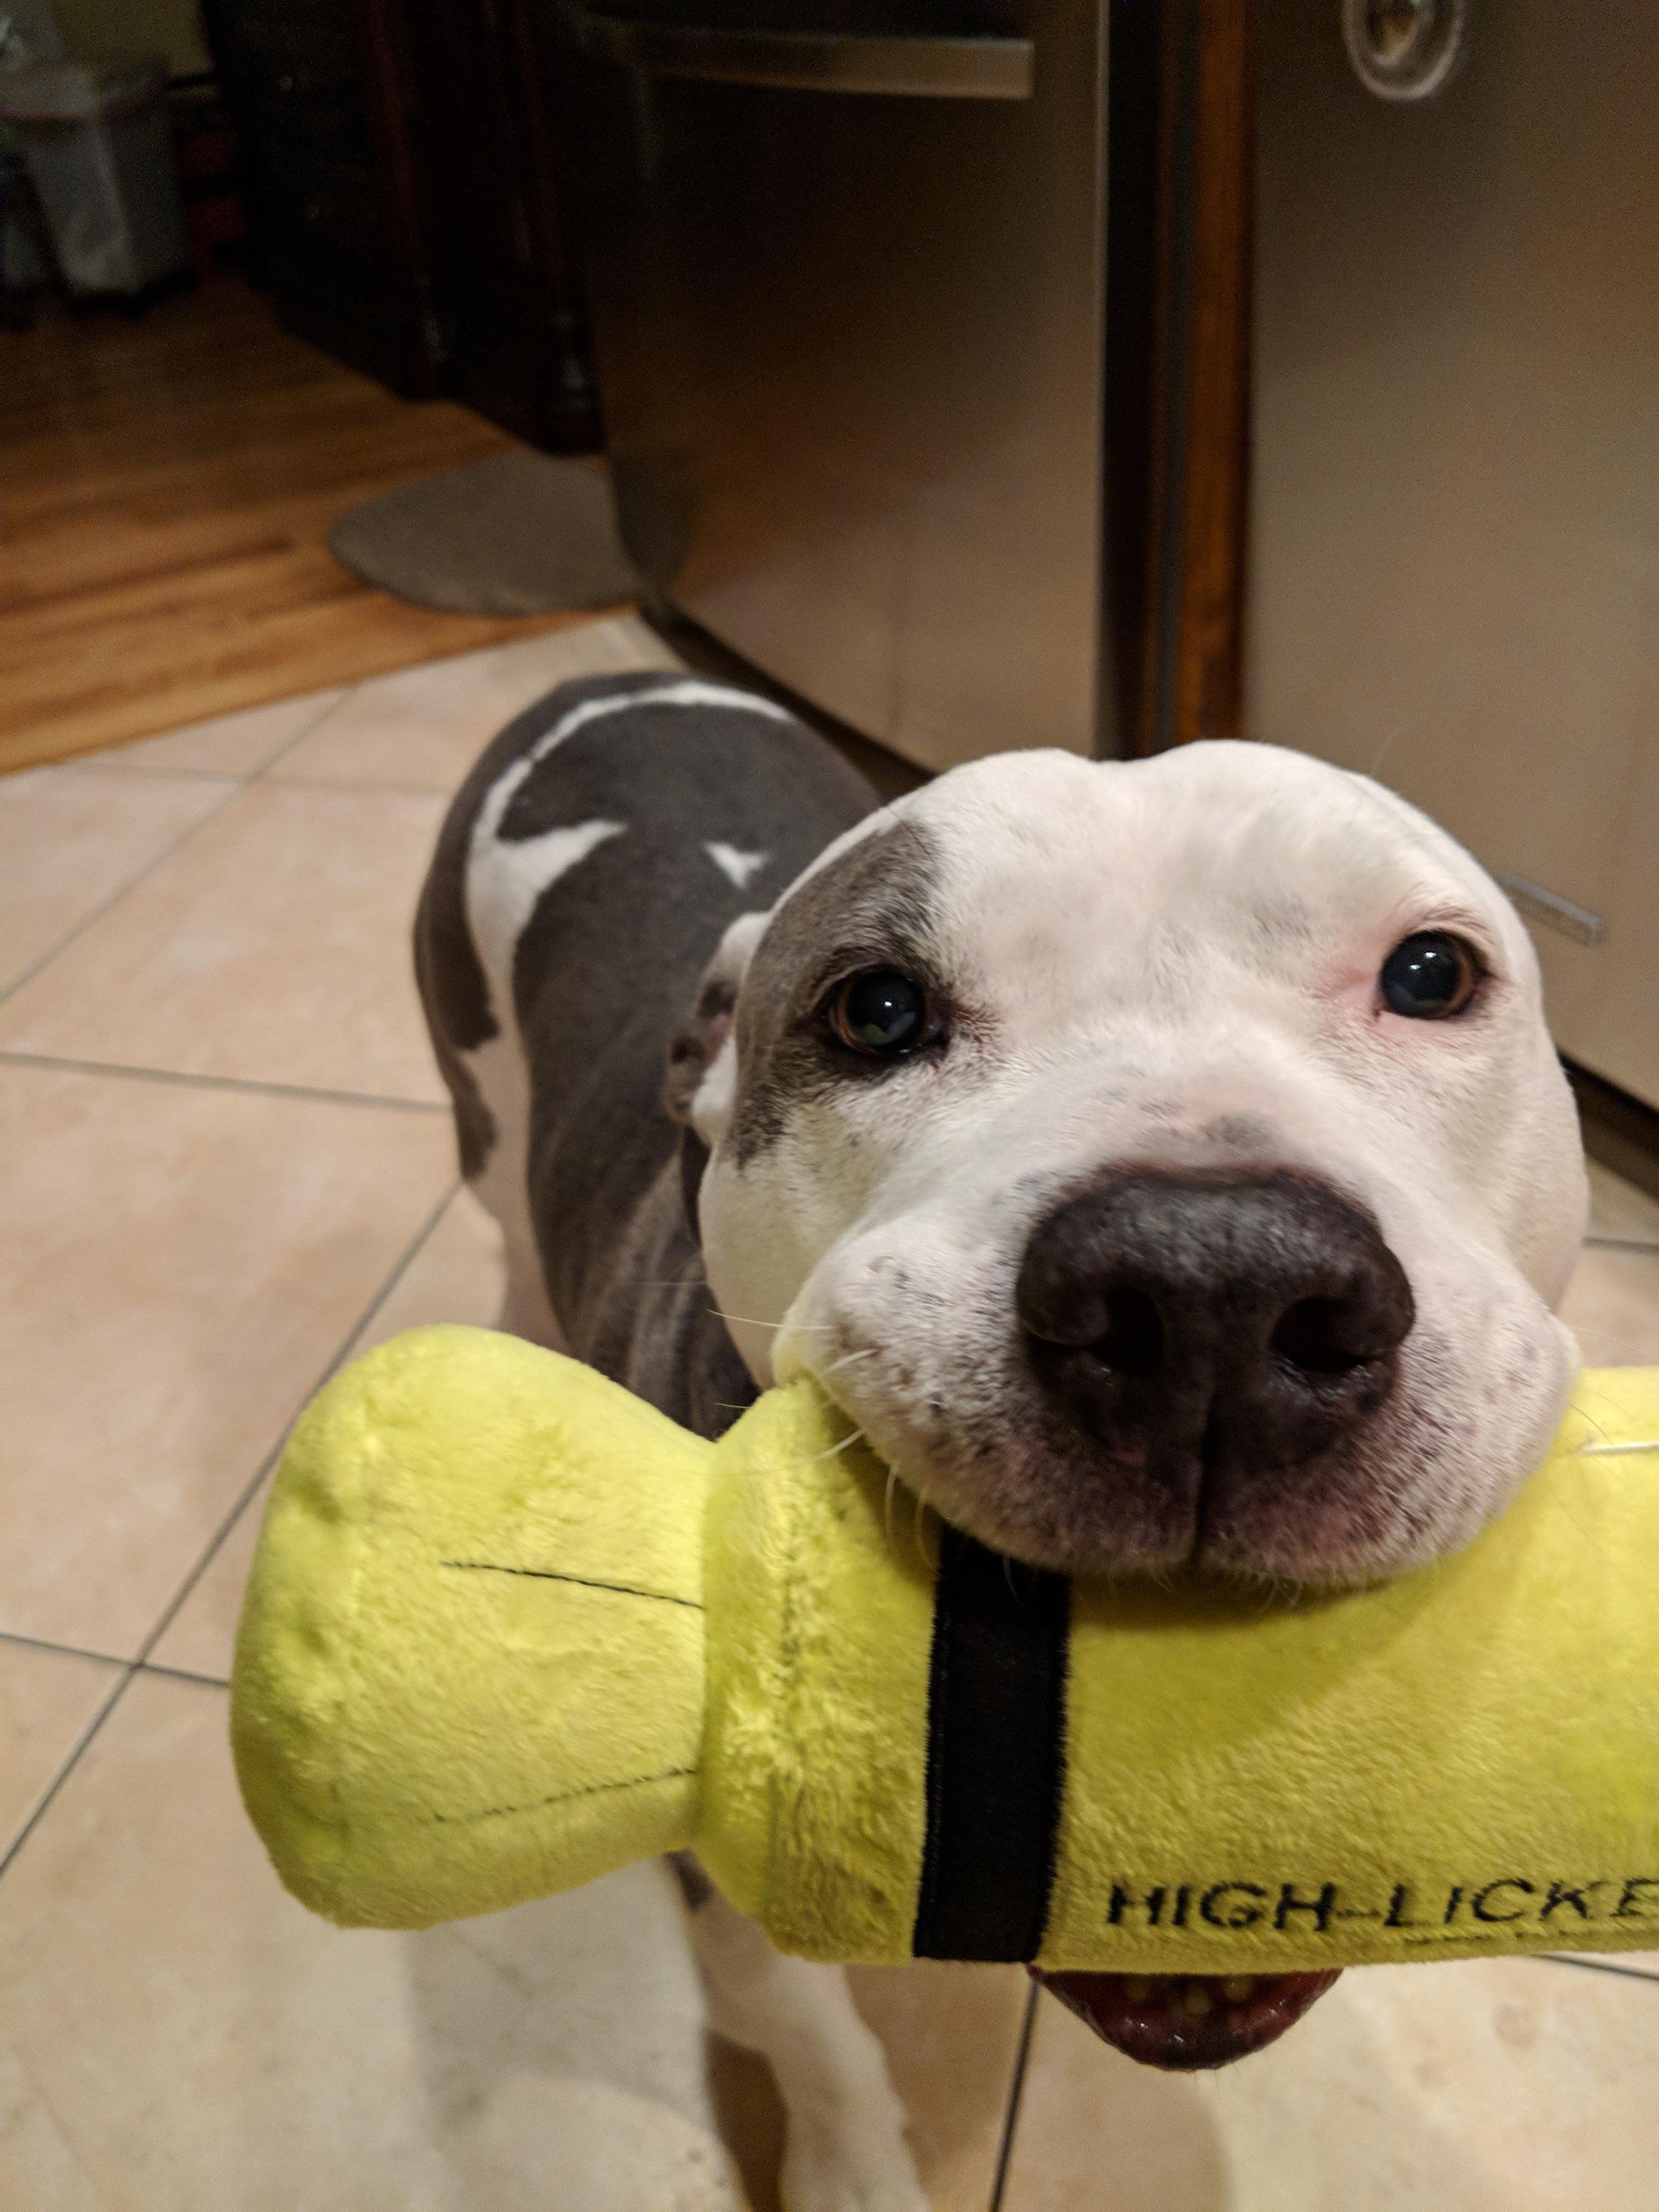 High Licker Pitbulls, Animals, Pit bulls